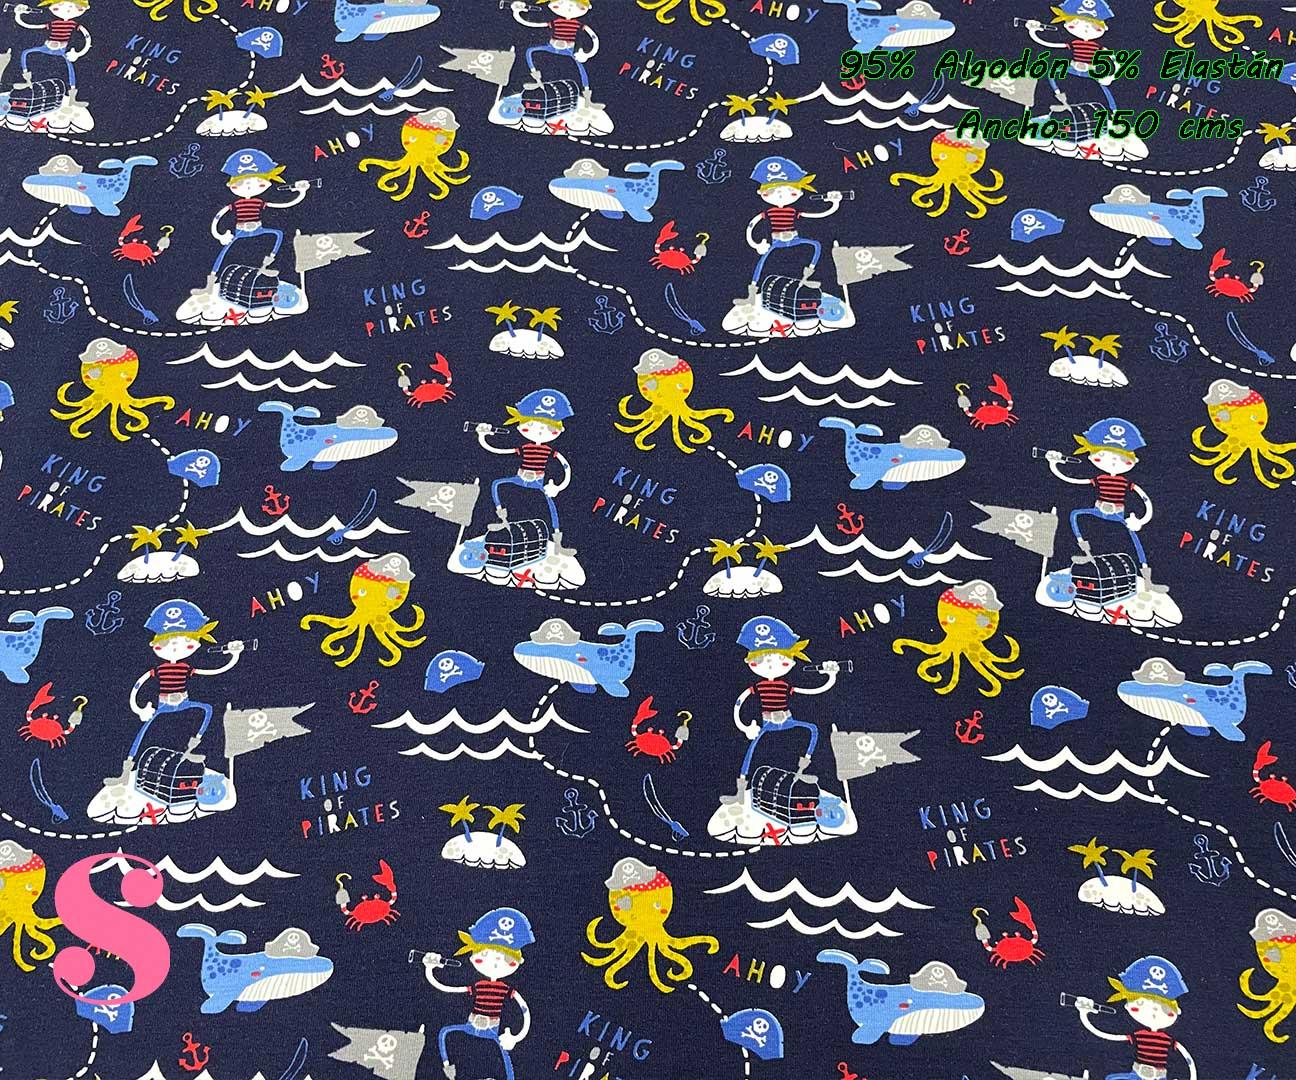 20-telas-de-primavera-infantiles,-estampados-infantiles-primaverales,-tela-arcoiris-de-algodón,tela-doble-gasa,Punto Camiseta Estampado Piratas